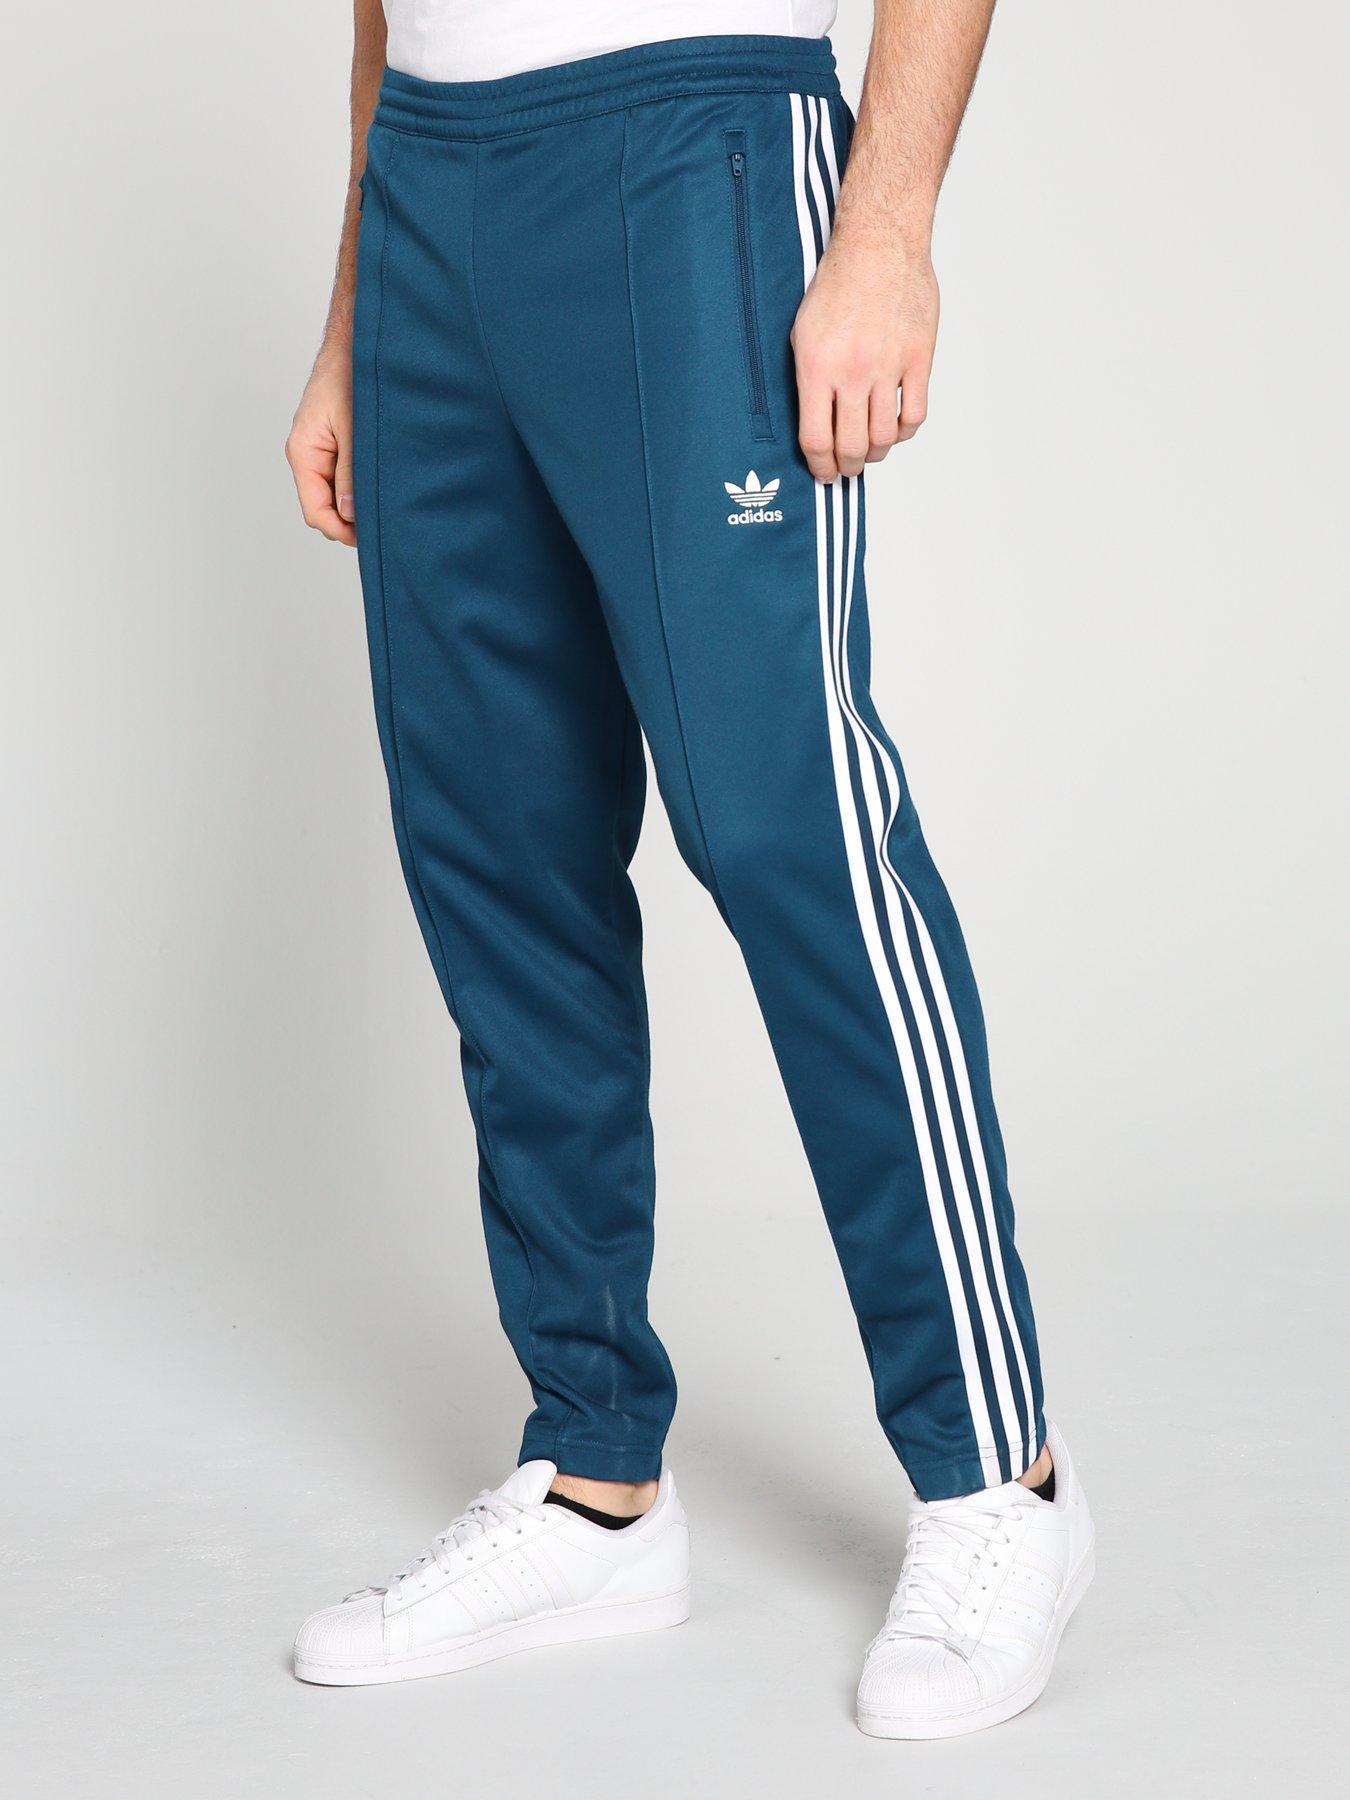 Adidas originals | Jogging bottoms | Sportswear | Men | www